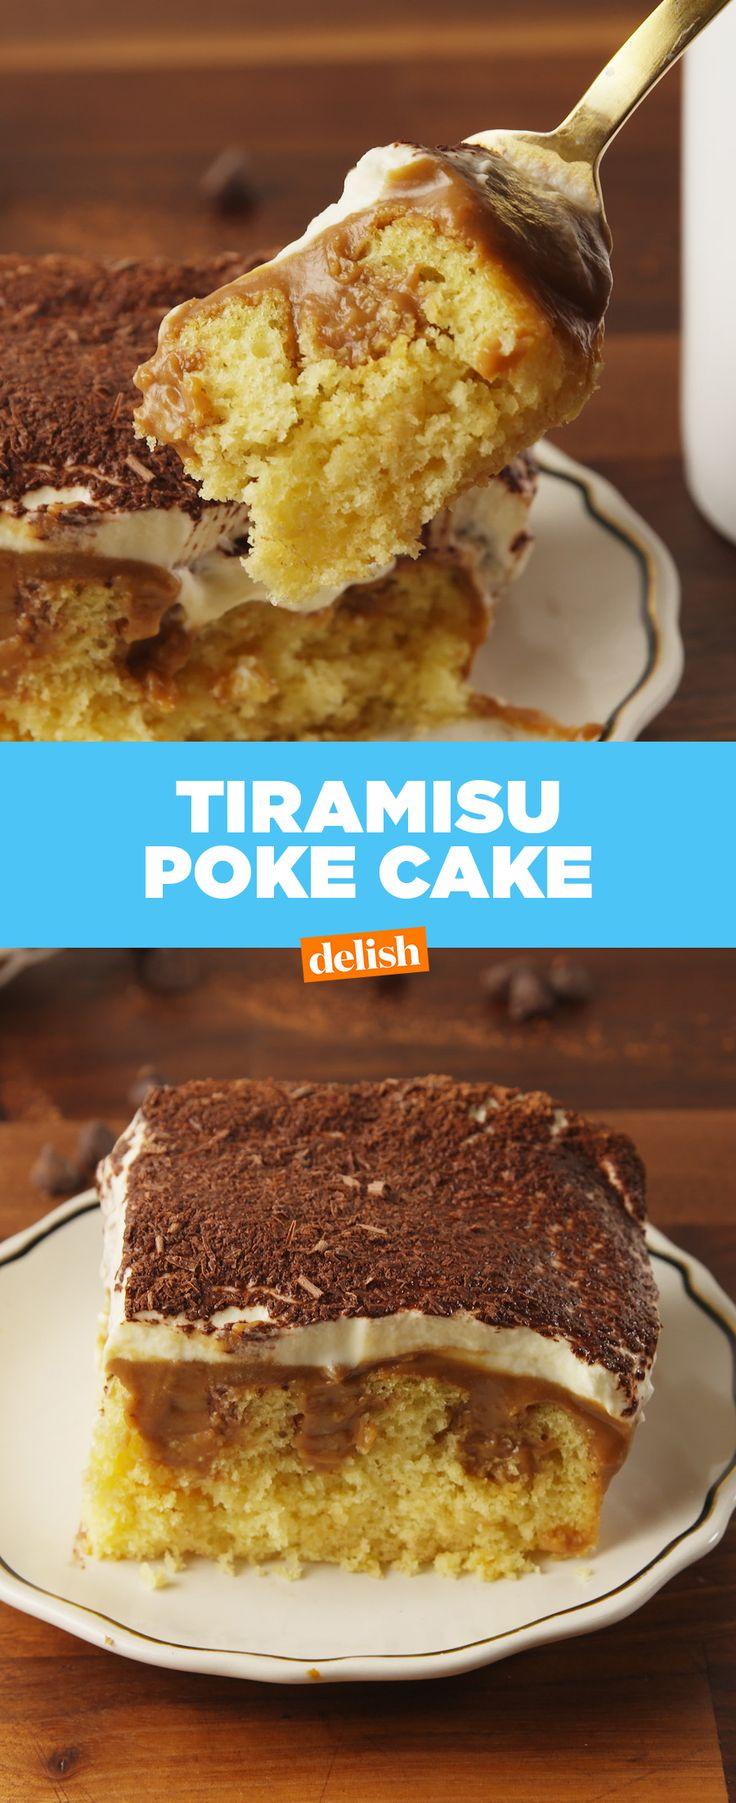 best 25 tiramisu cake ideas only on pinterest tiramisu tiramisu trifle and italian tiramisu. Black Bedroom Furniture Sets. Home Design Ideas